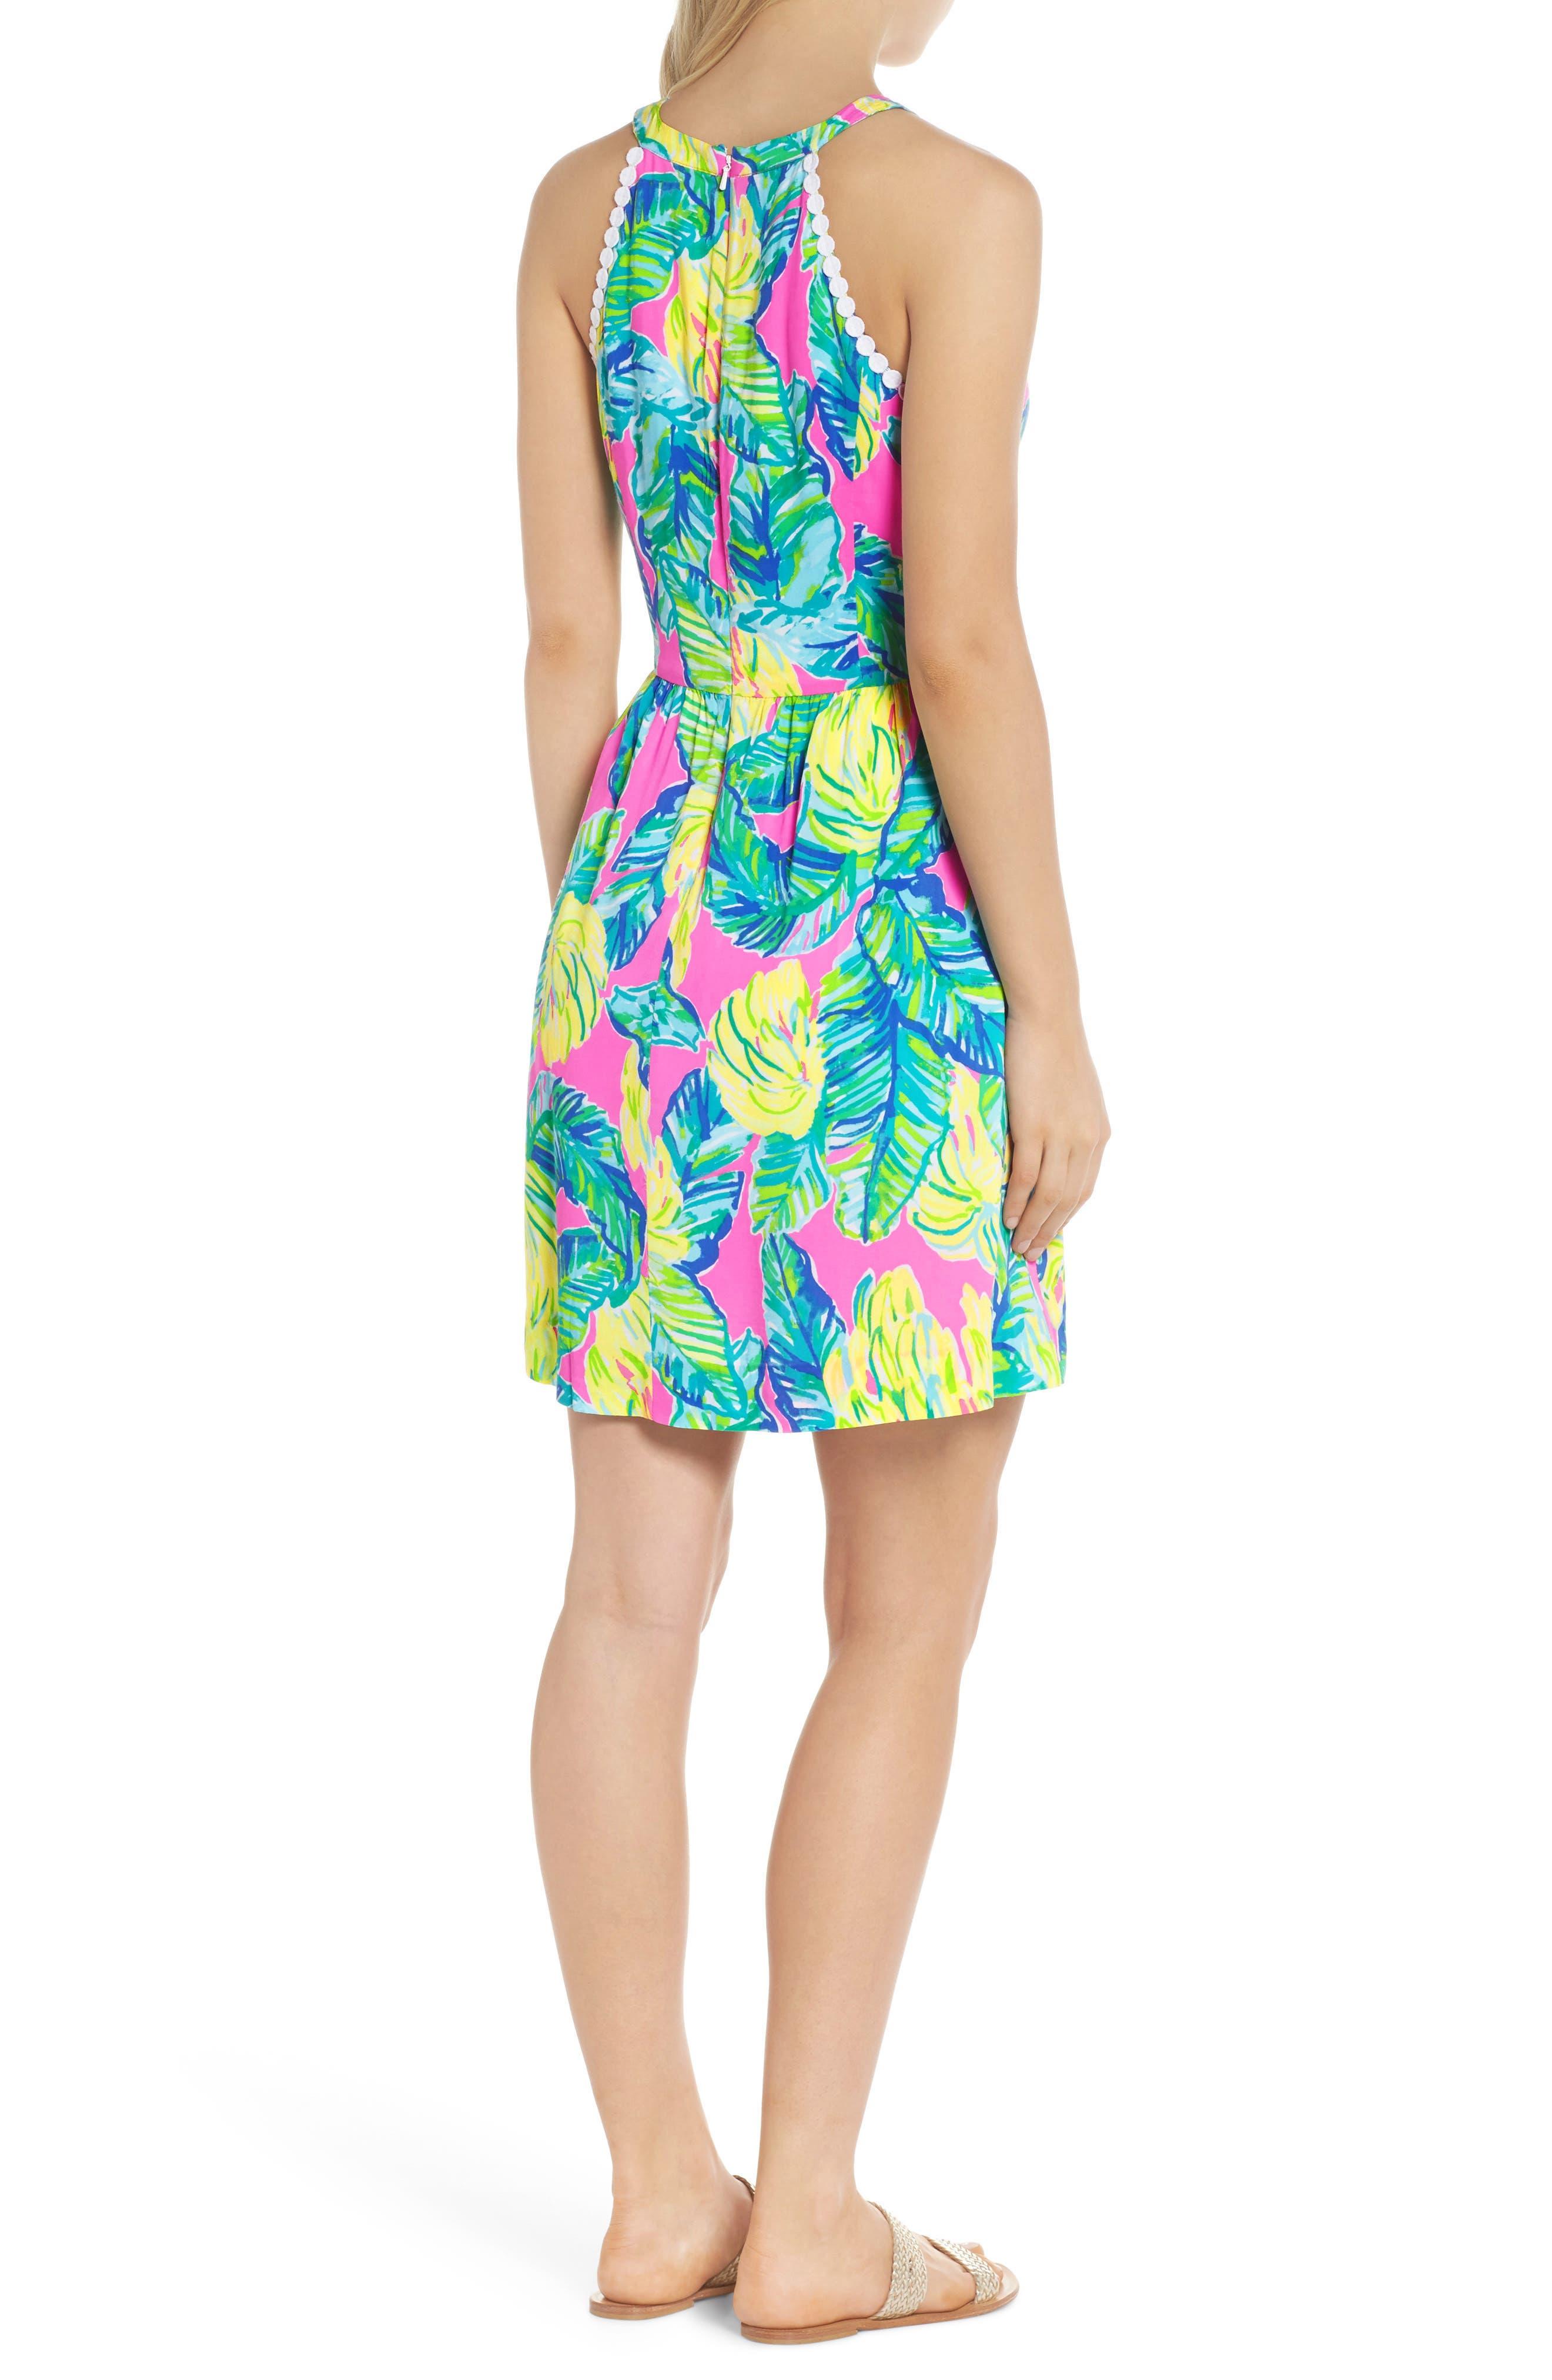 Kinley Halter Dress,                             Alternate thumbnail 2, color,                             PINK SUNSET LOCAL FLAVOR